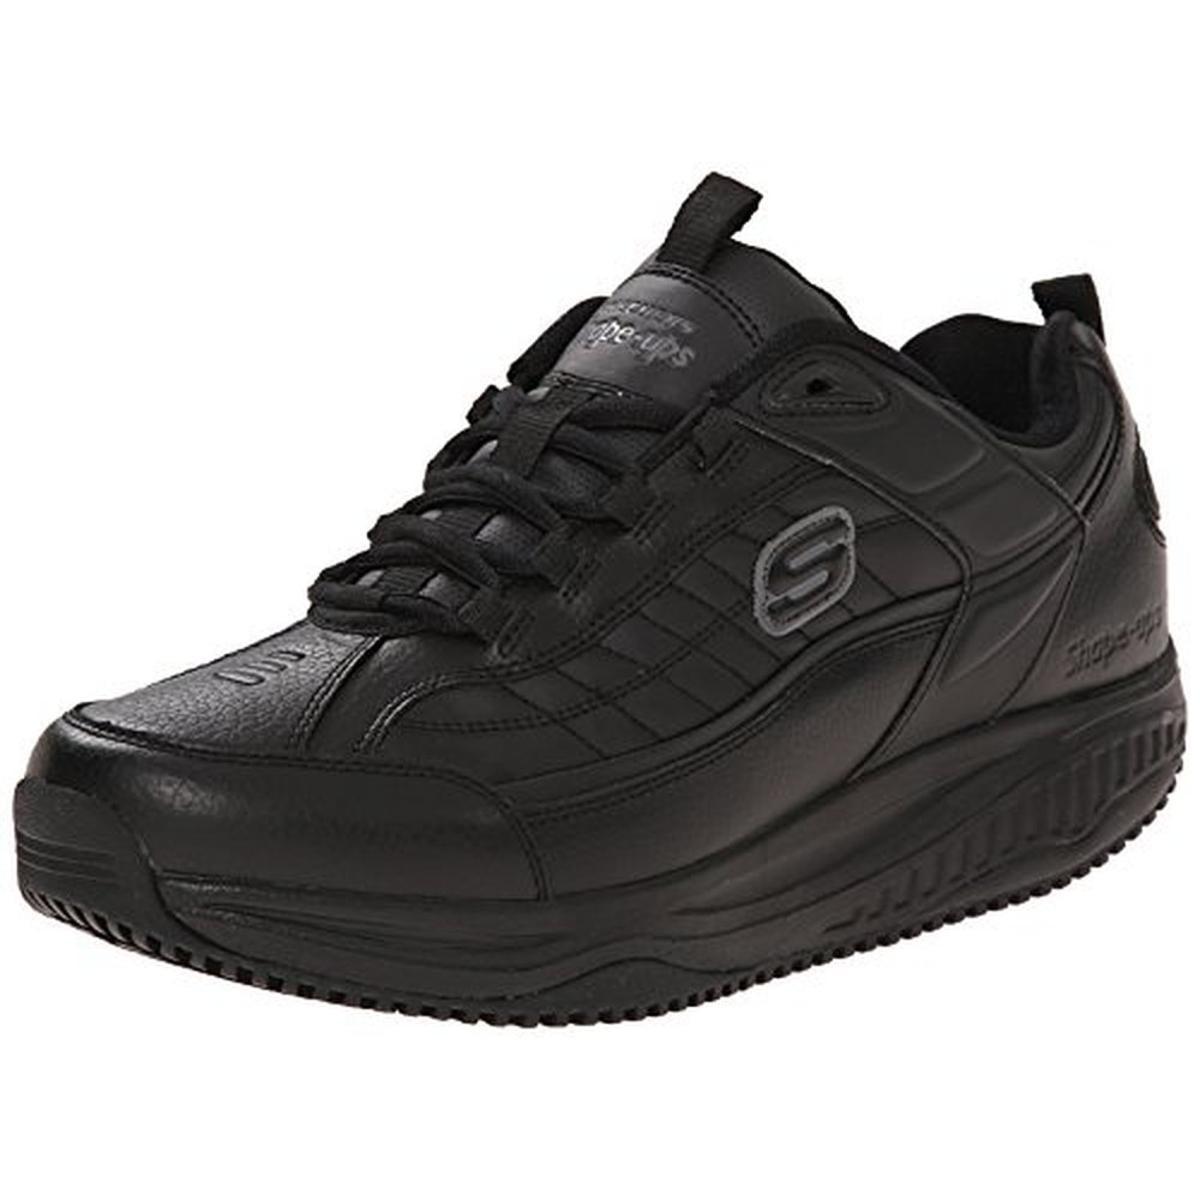 Skechers Mens Shapes Ups Exeter Leather Slip Resistant At...